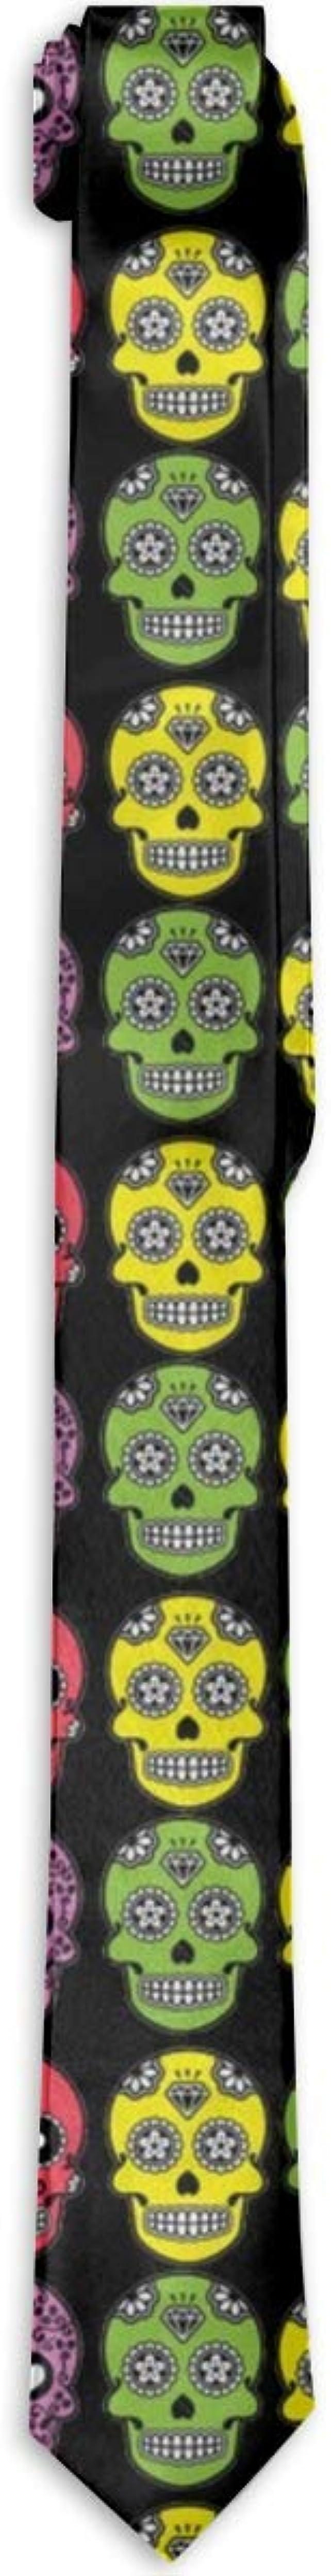 Cosicstore Accesorio de disfraz de Halloween con calavera mexicana ...